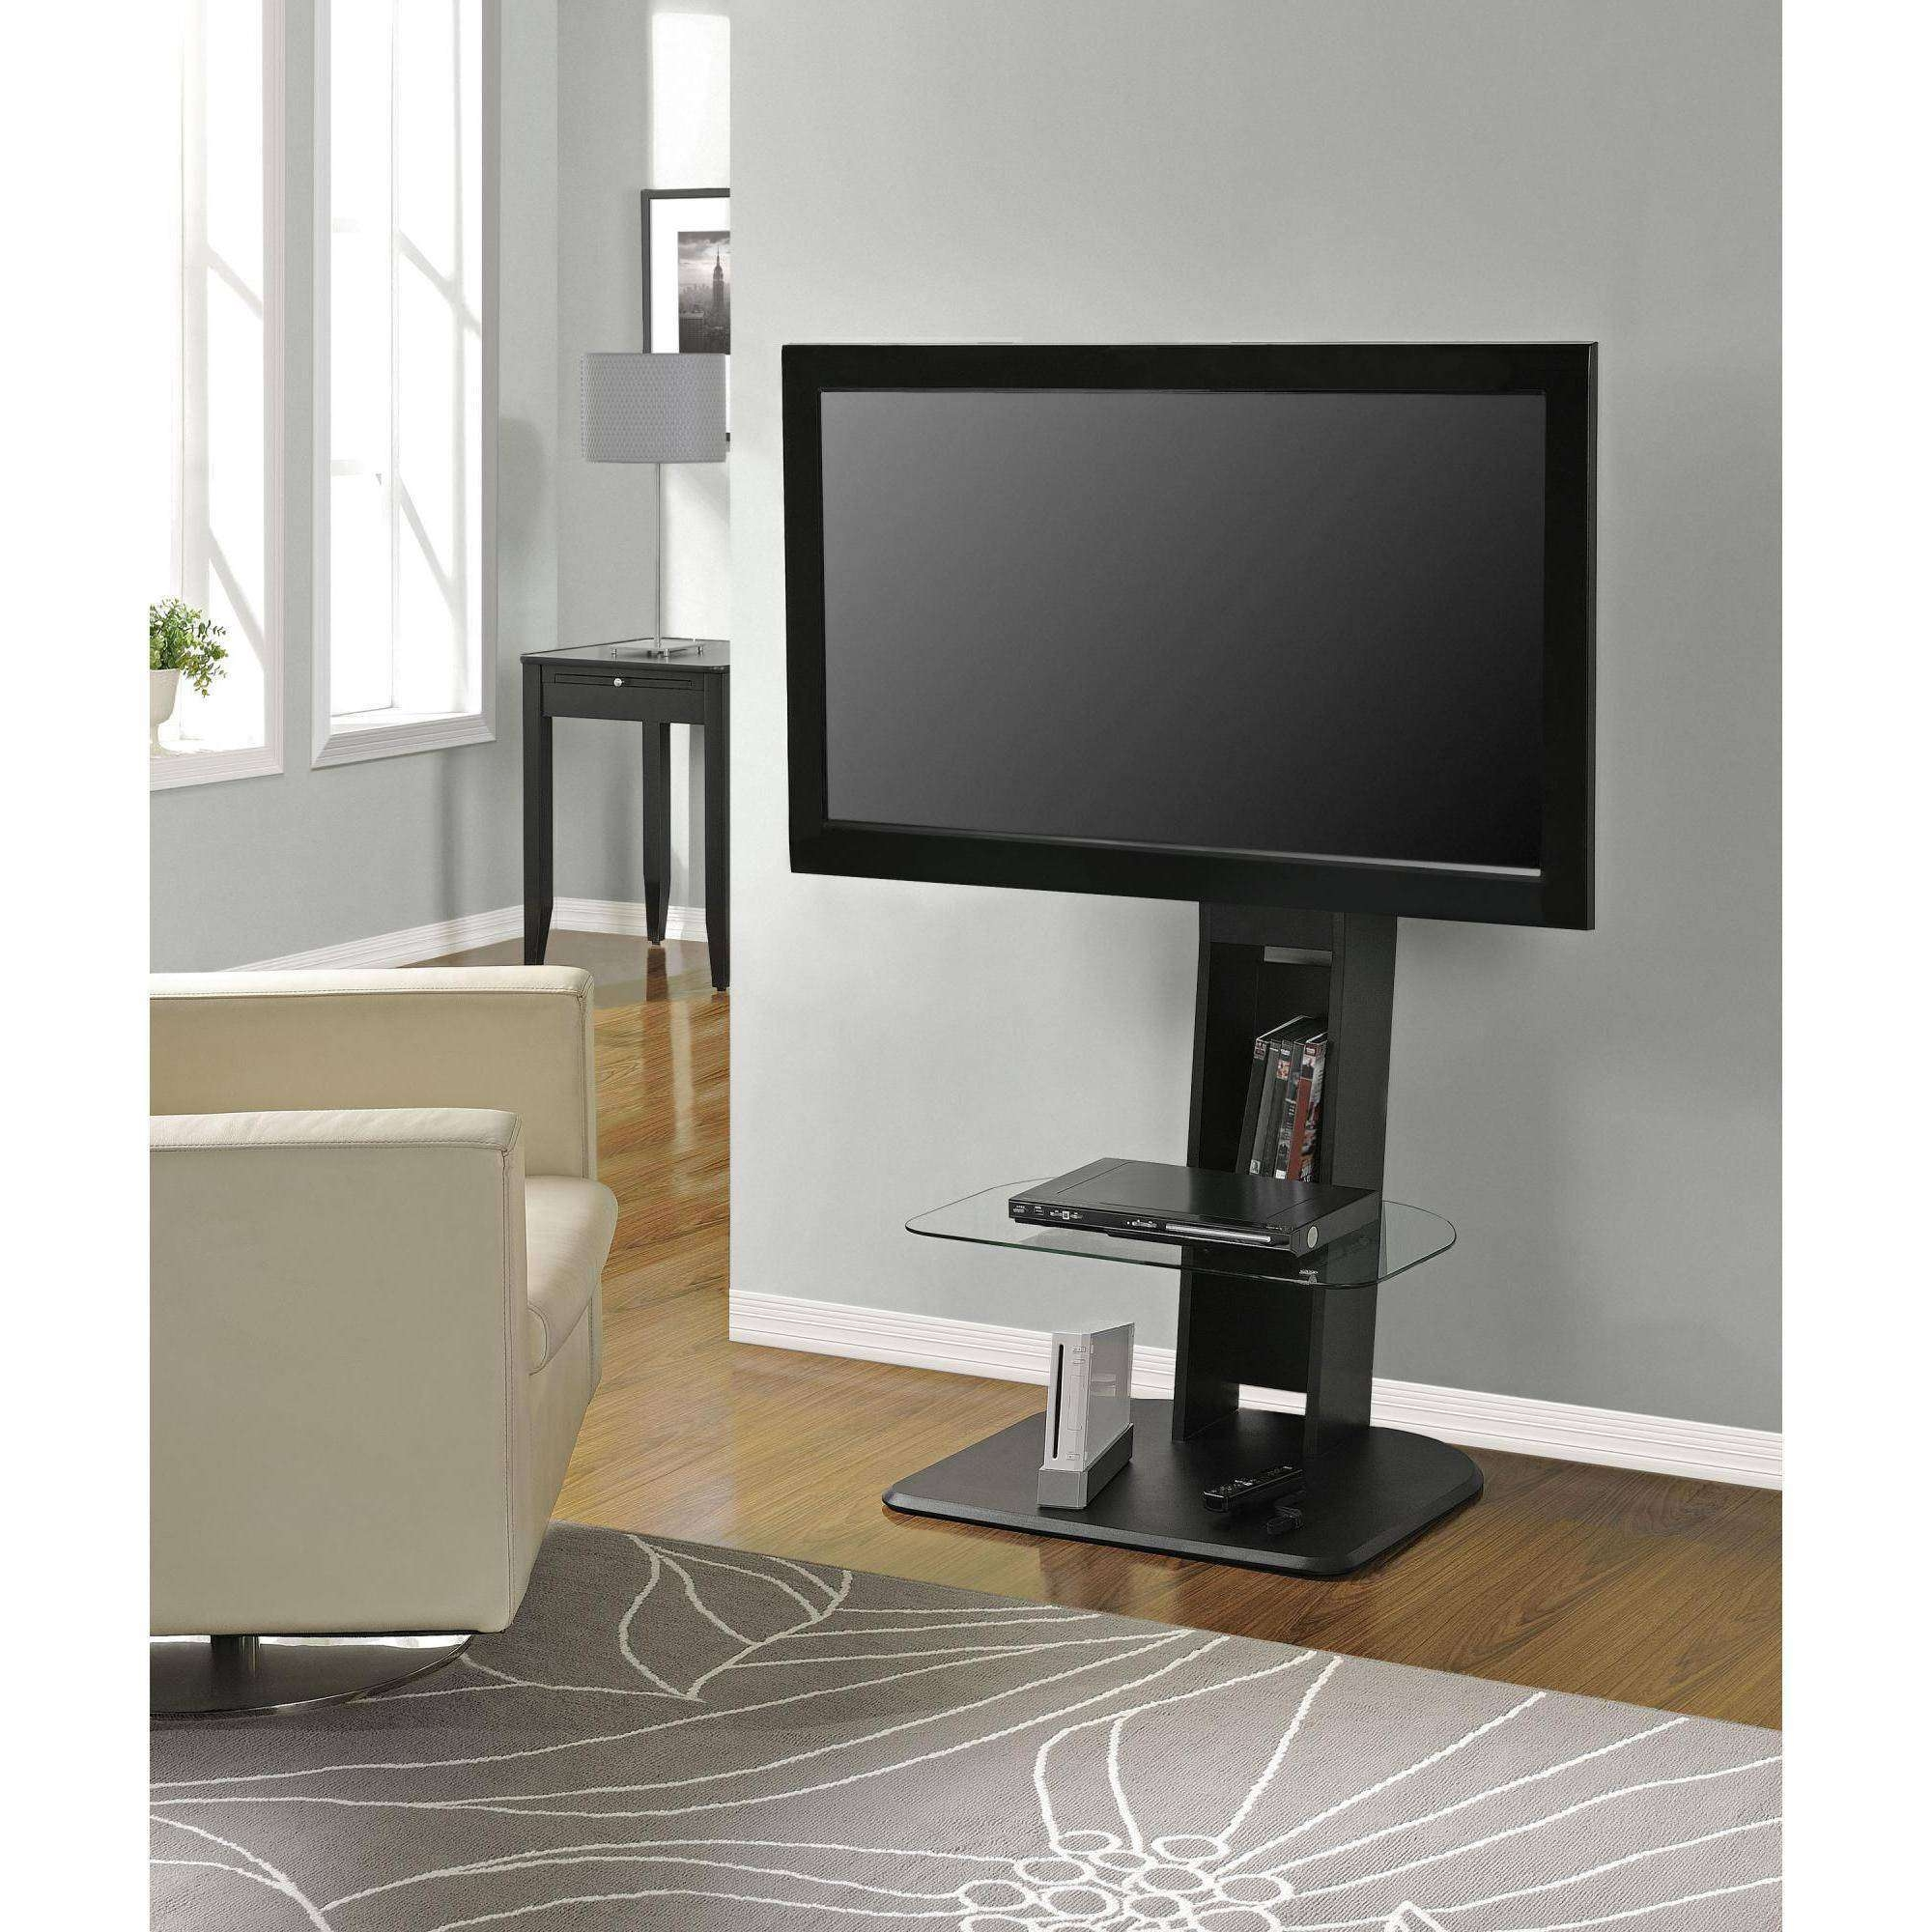 "Jaxx Black/grey Corner Tv Stand For Tvs Up To 40"" – Walmart With Regard To Slimline Tv Stands (Gallery 6 of 15)"